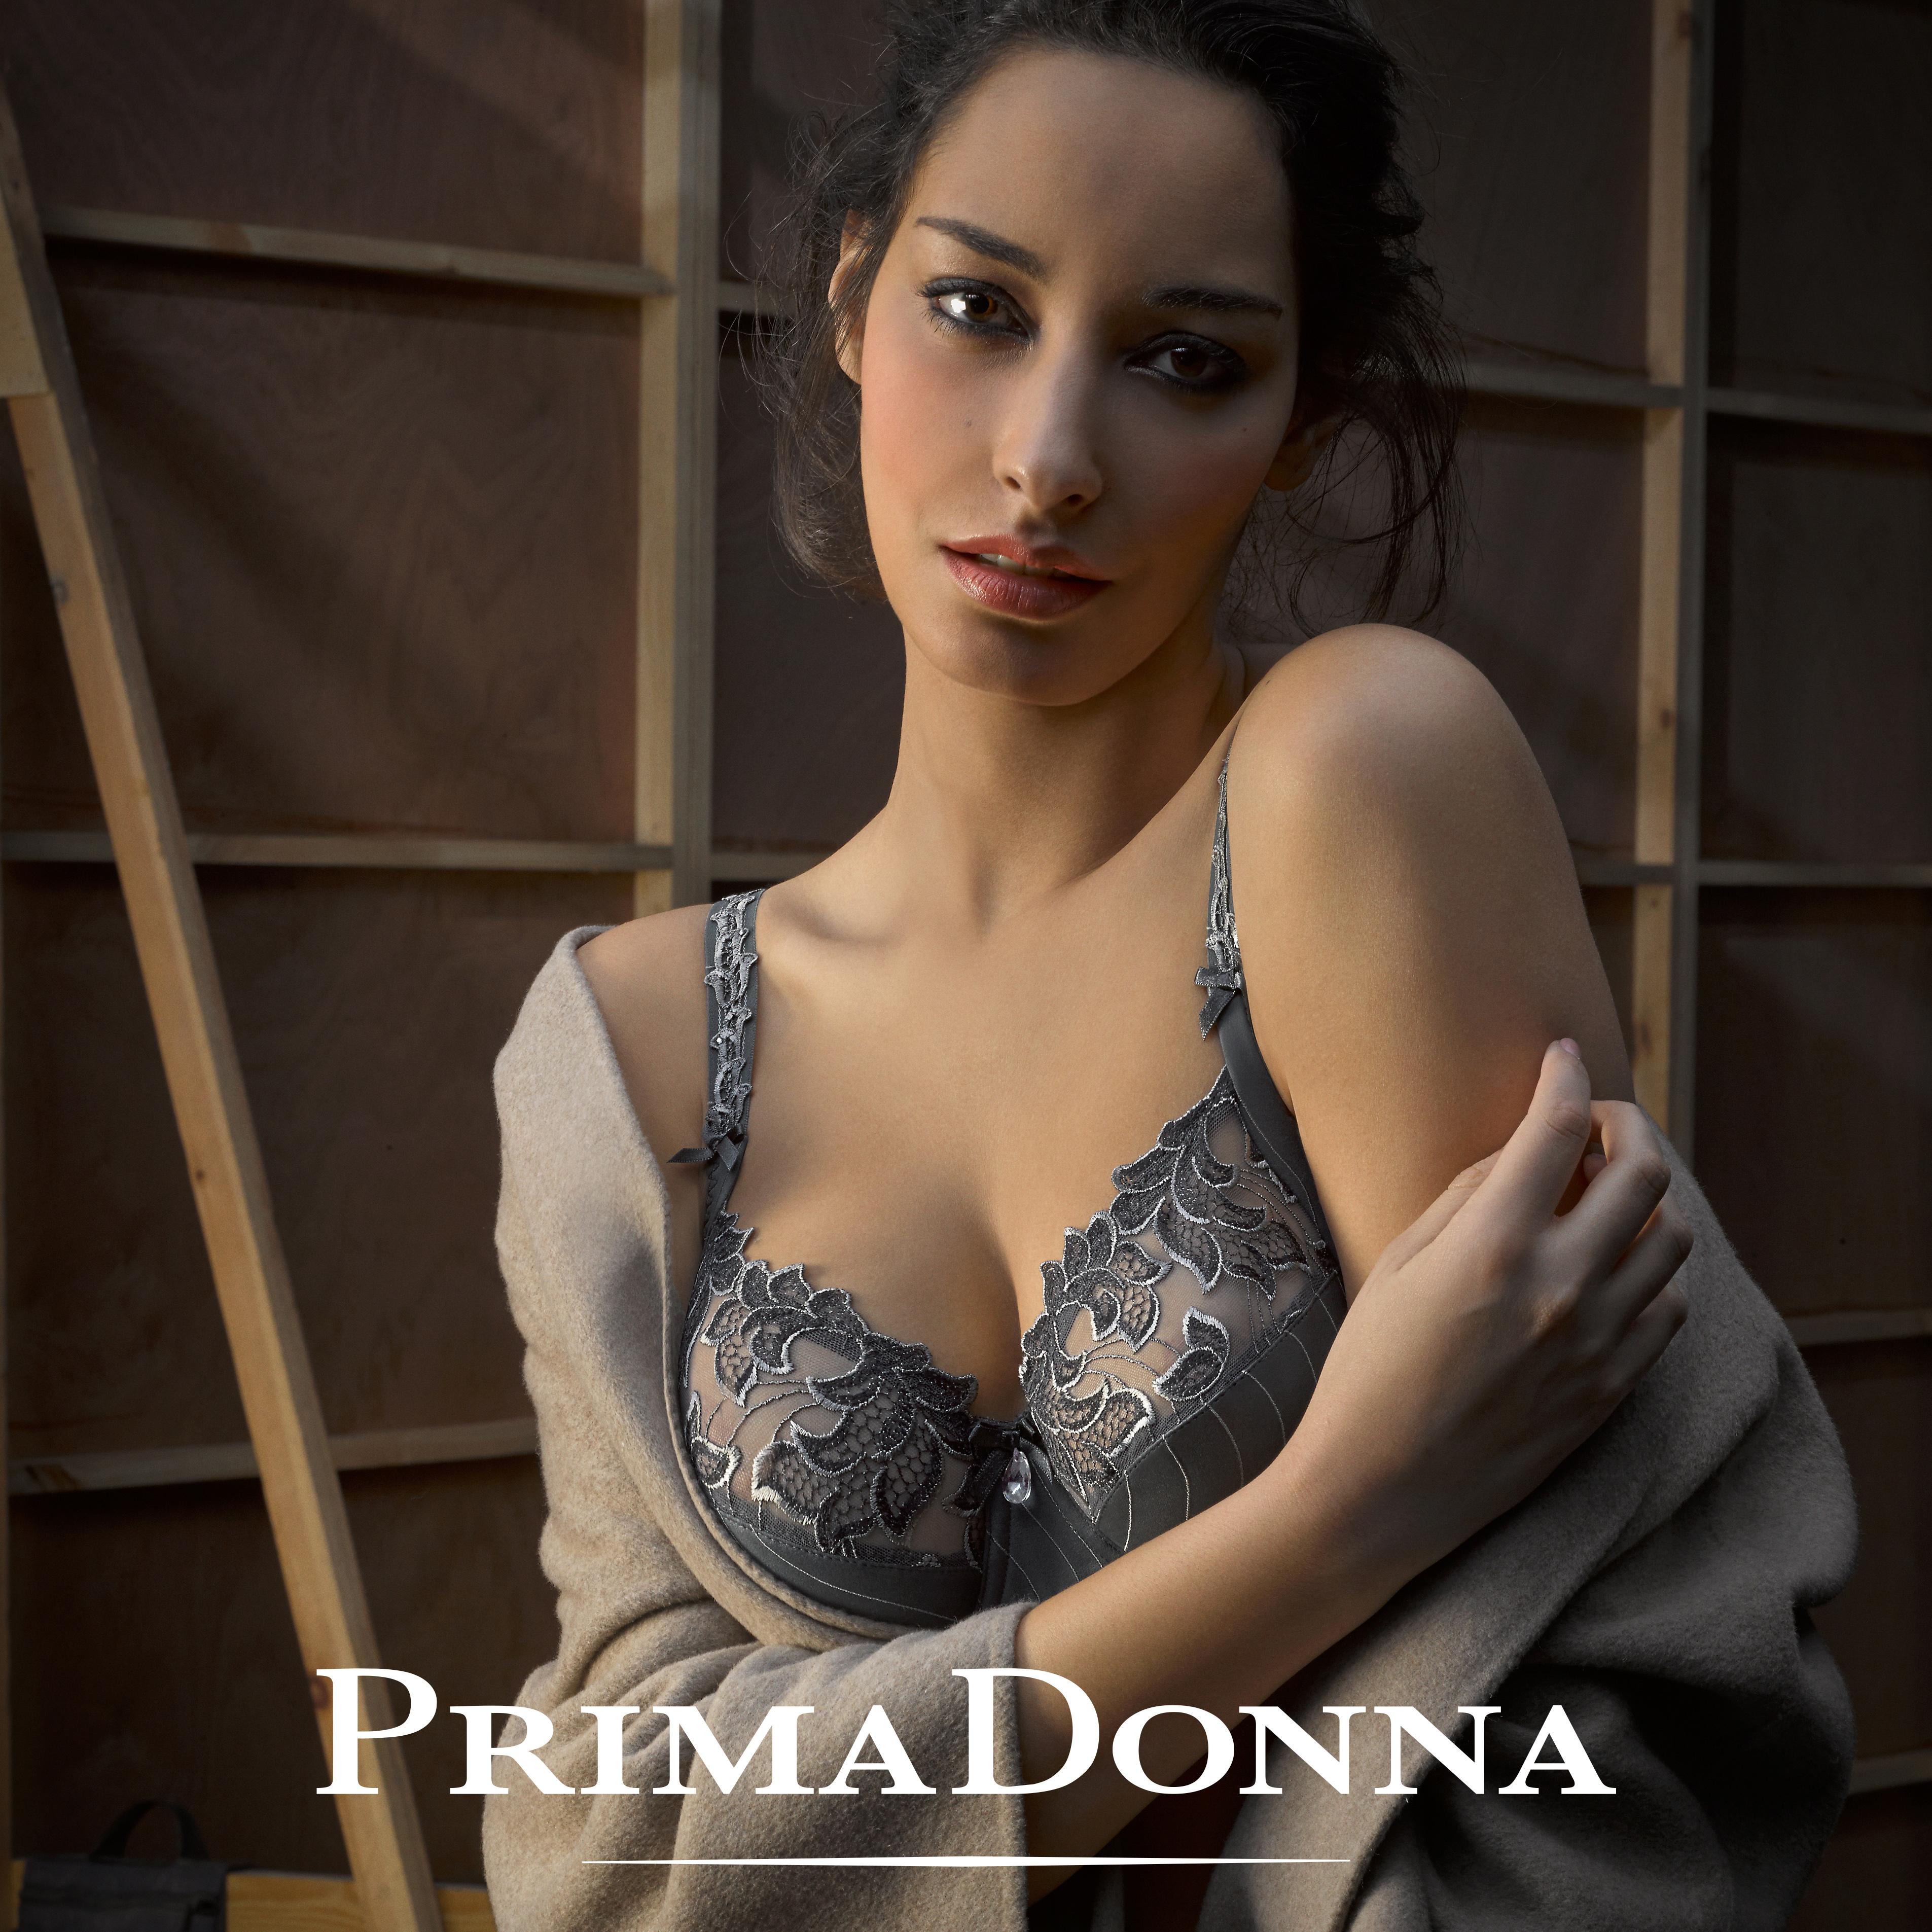 PrimaDonna_Deaville_WinterGrey2